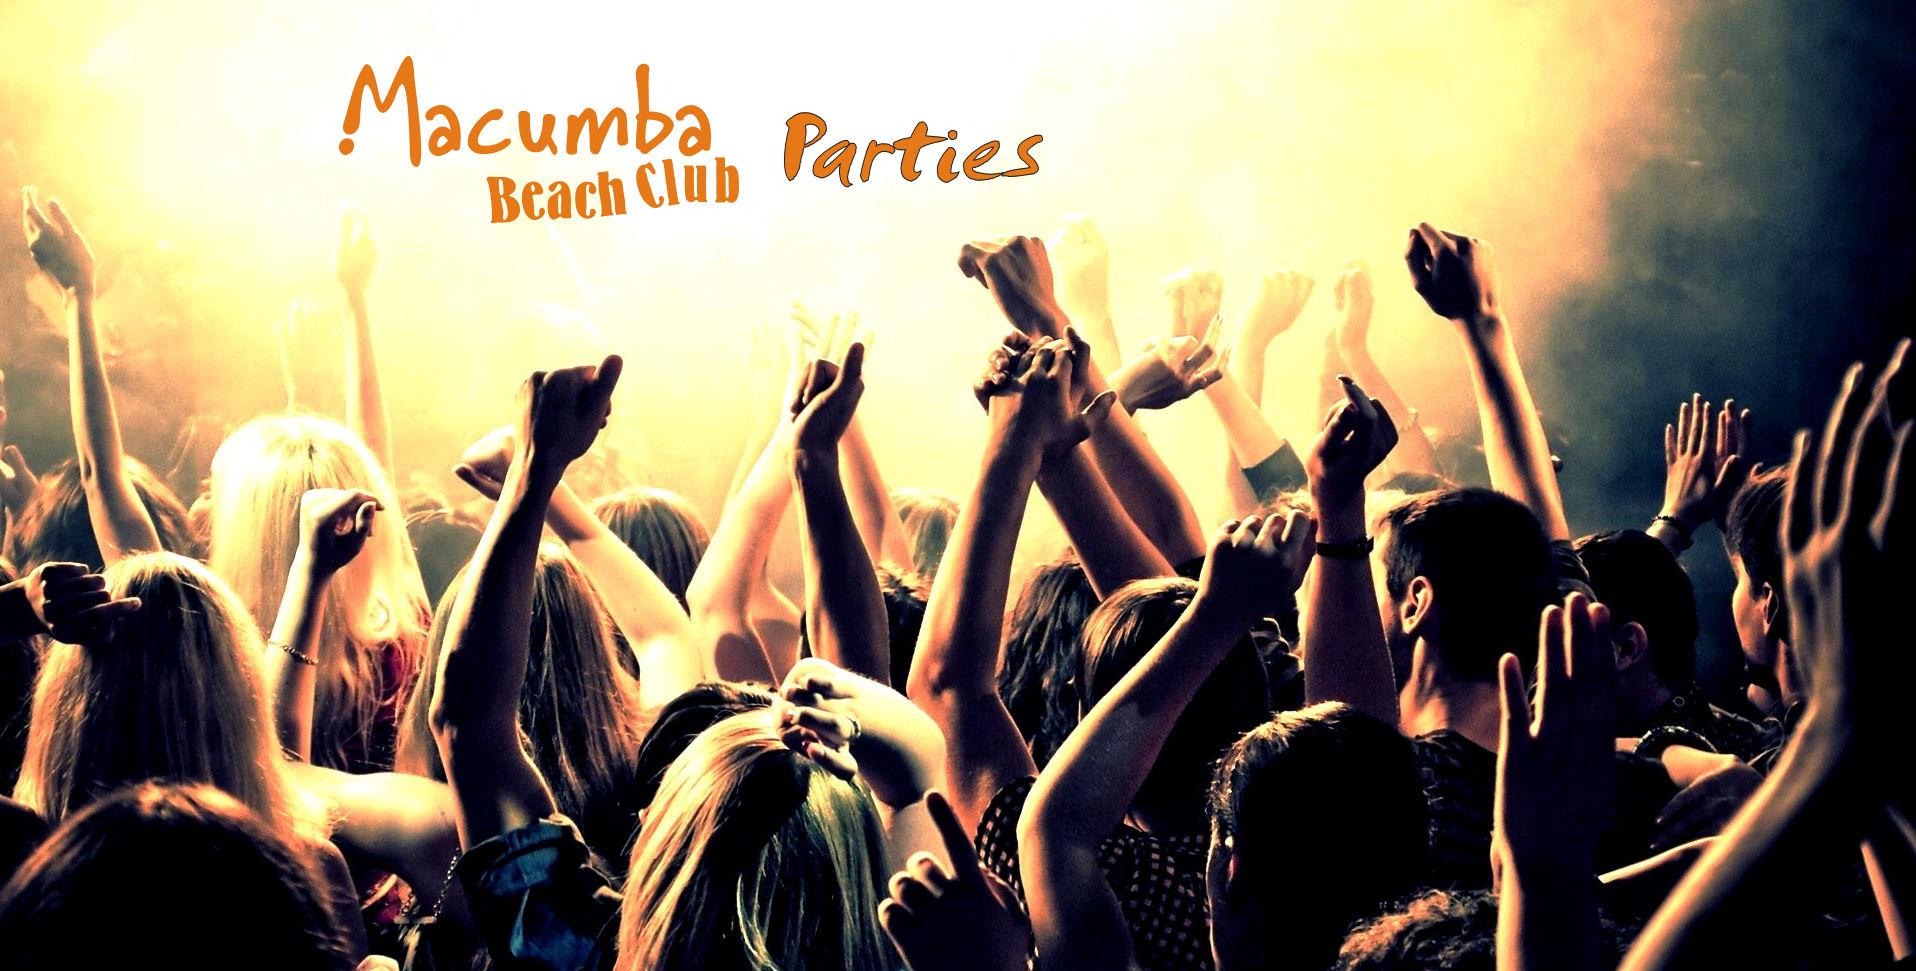 Macumba beach club events